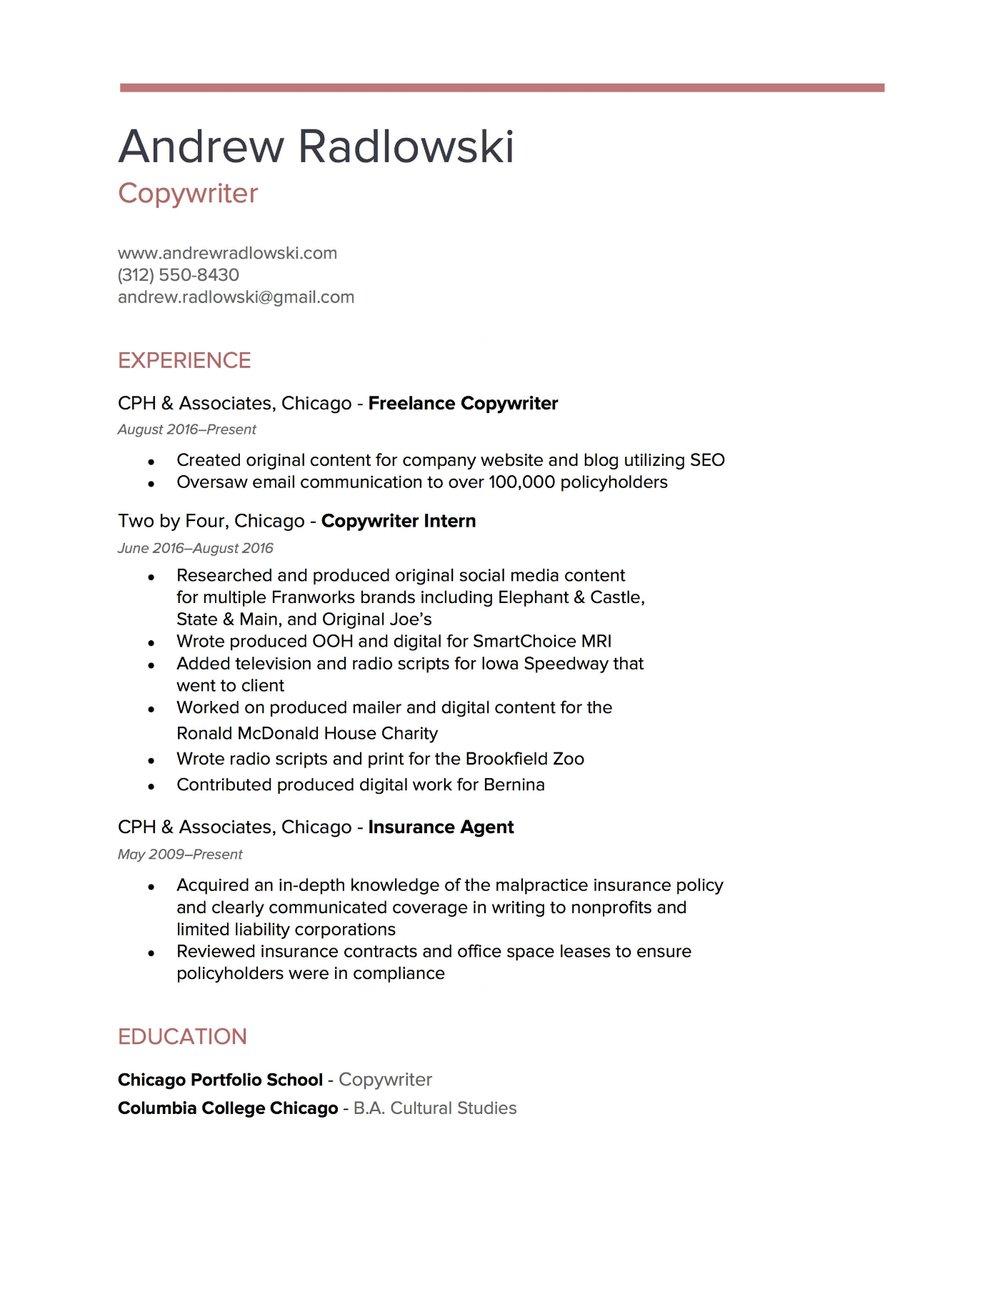 Andrew Radlowski Copywriter  Copywriter Resume